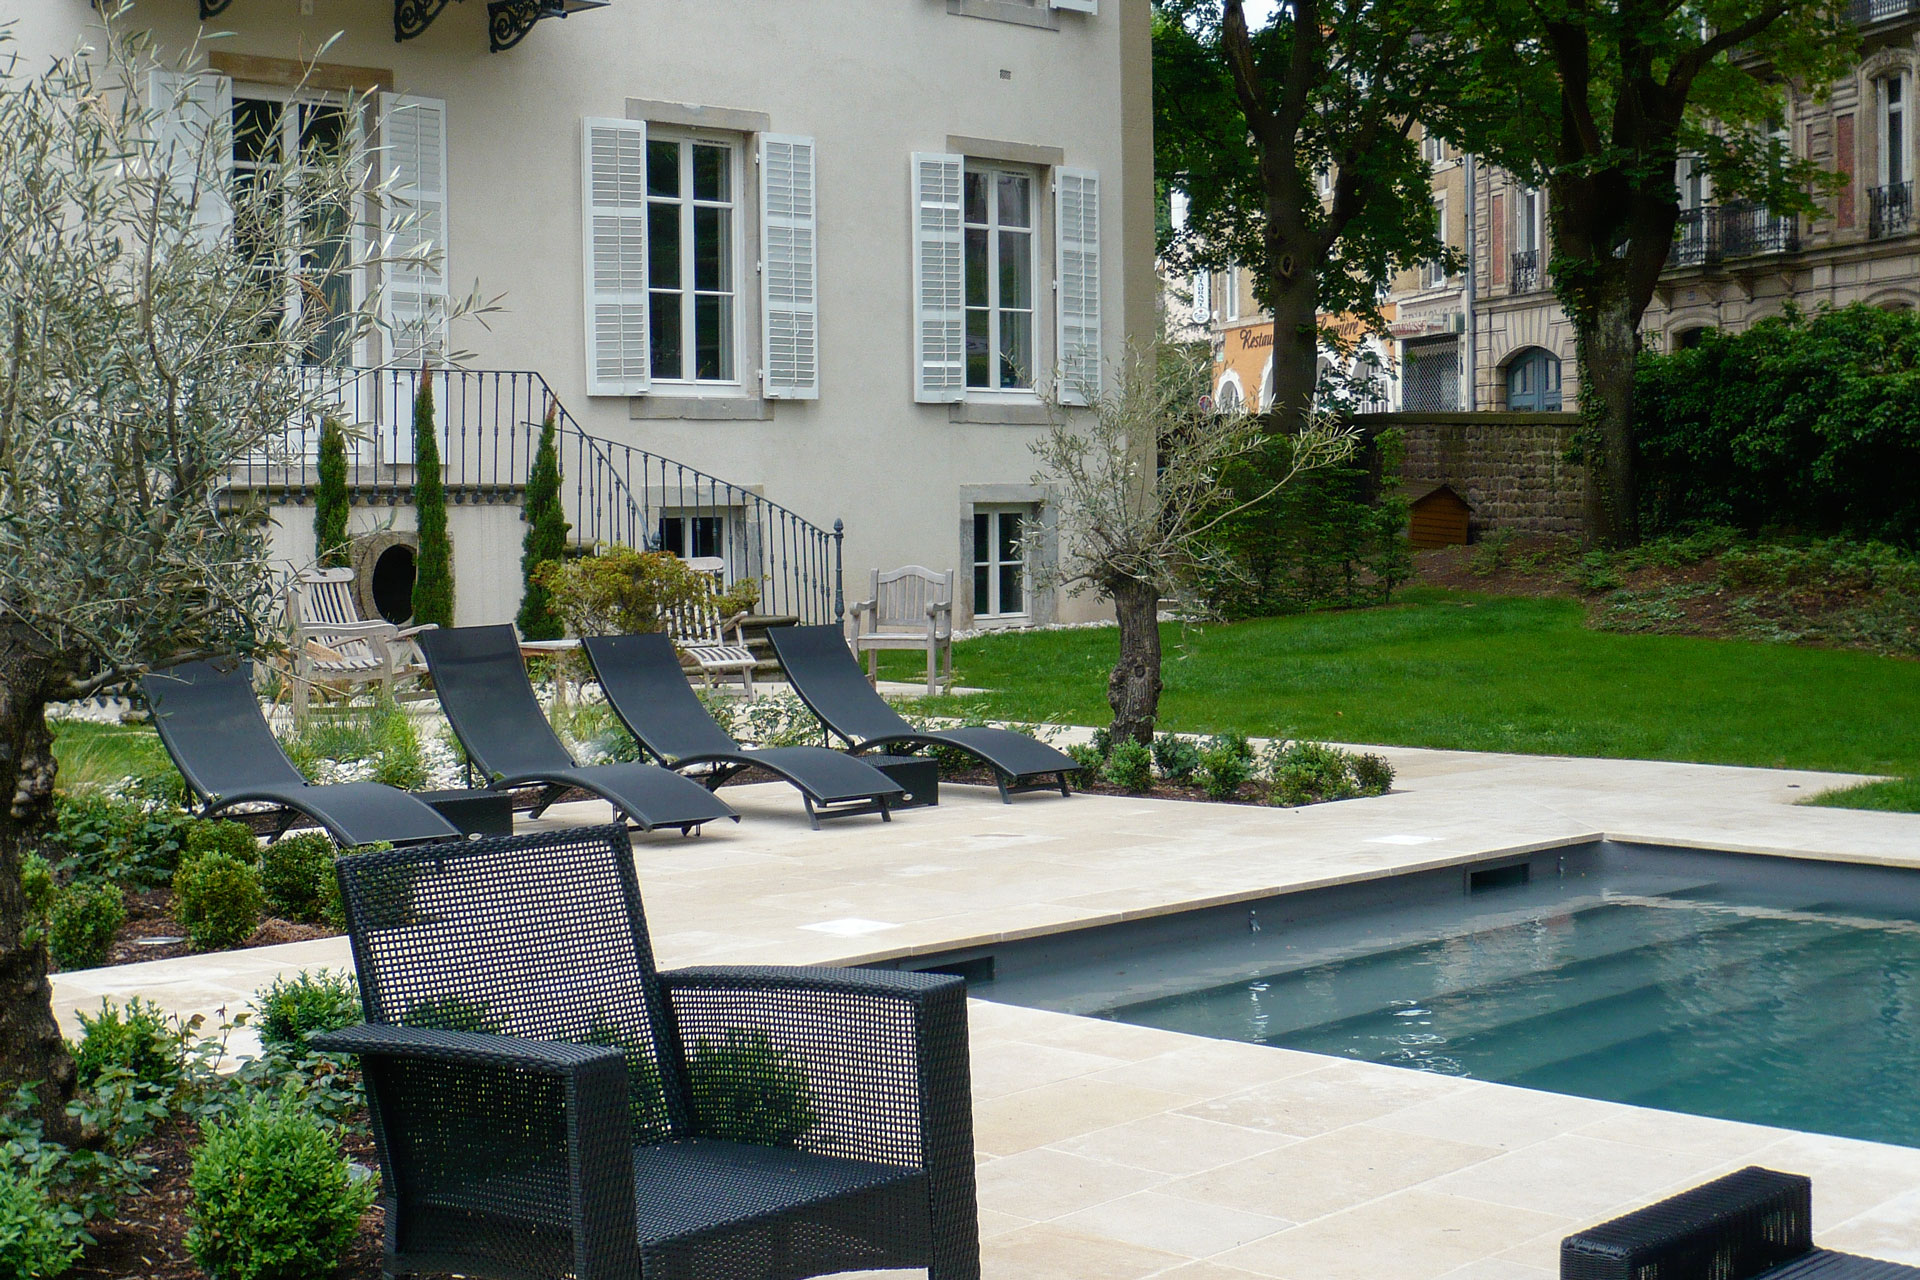 creation d un jardin 08 11. Black Bedroom Furniture Sets. Home Design Ideas